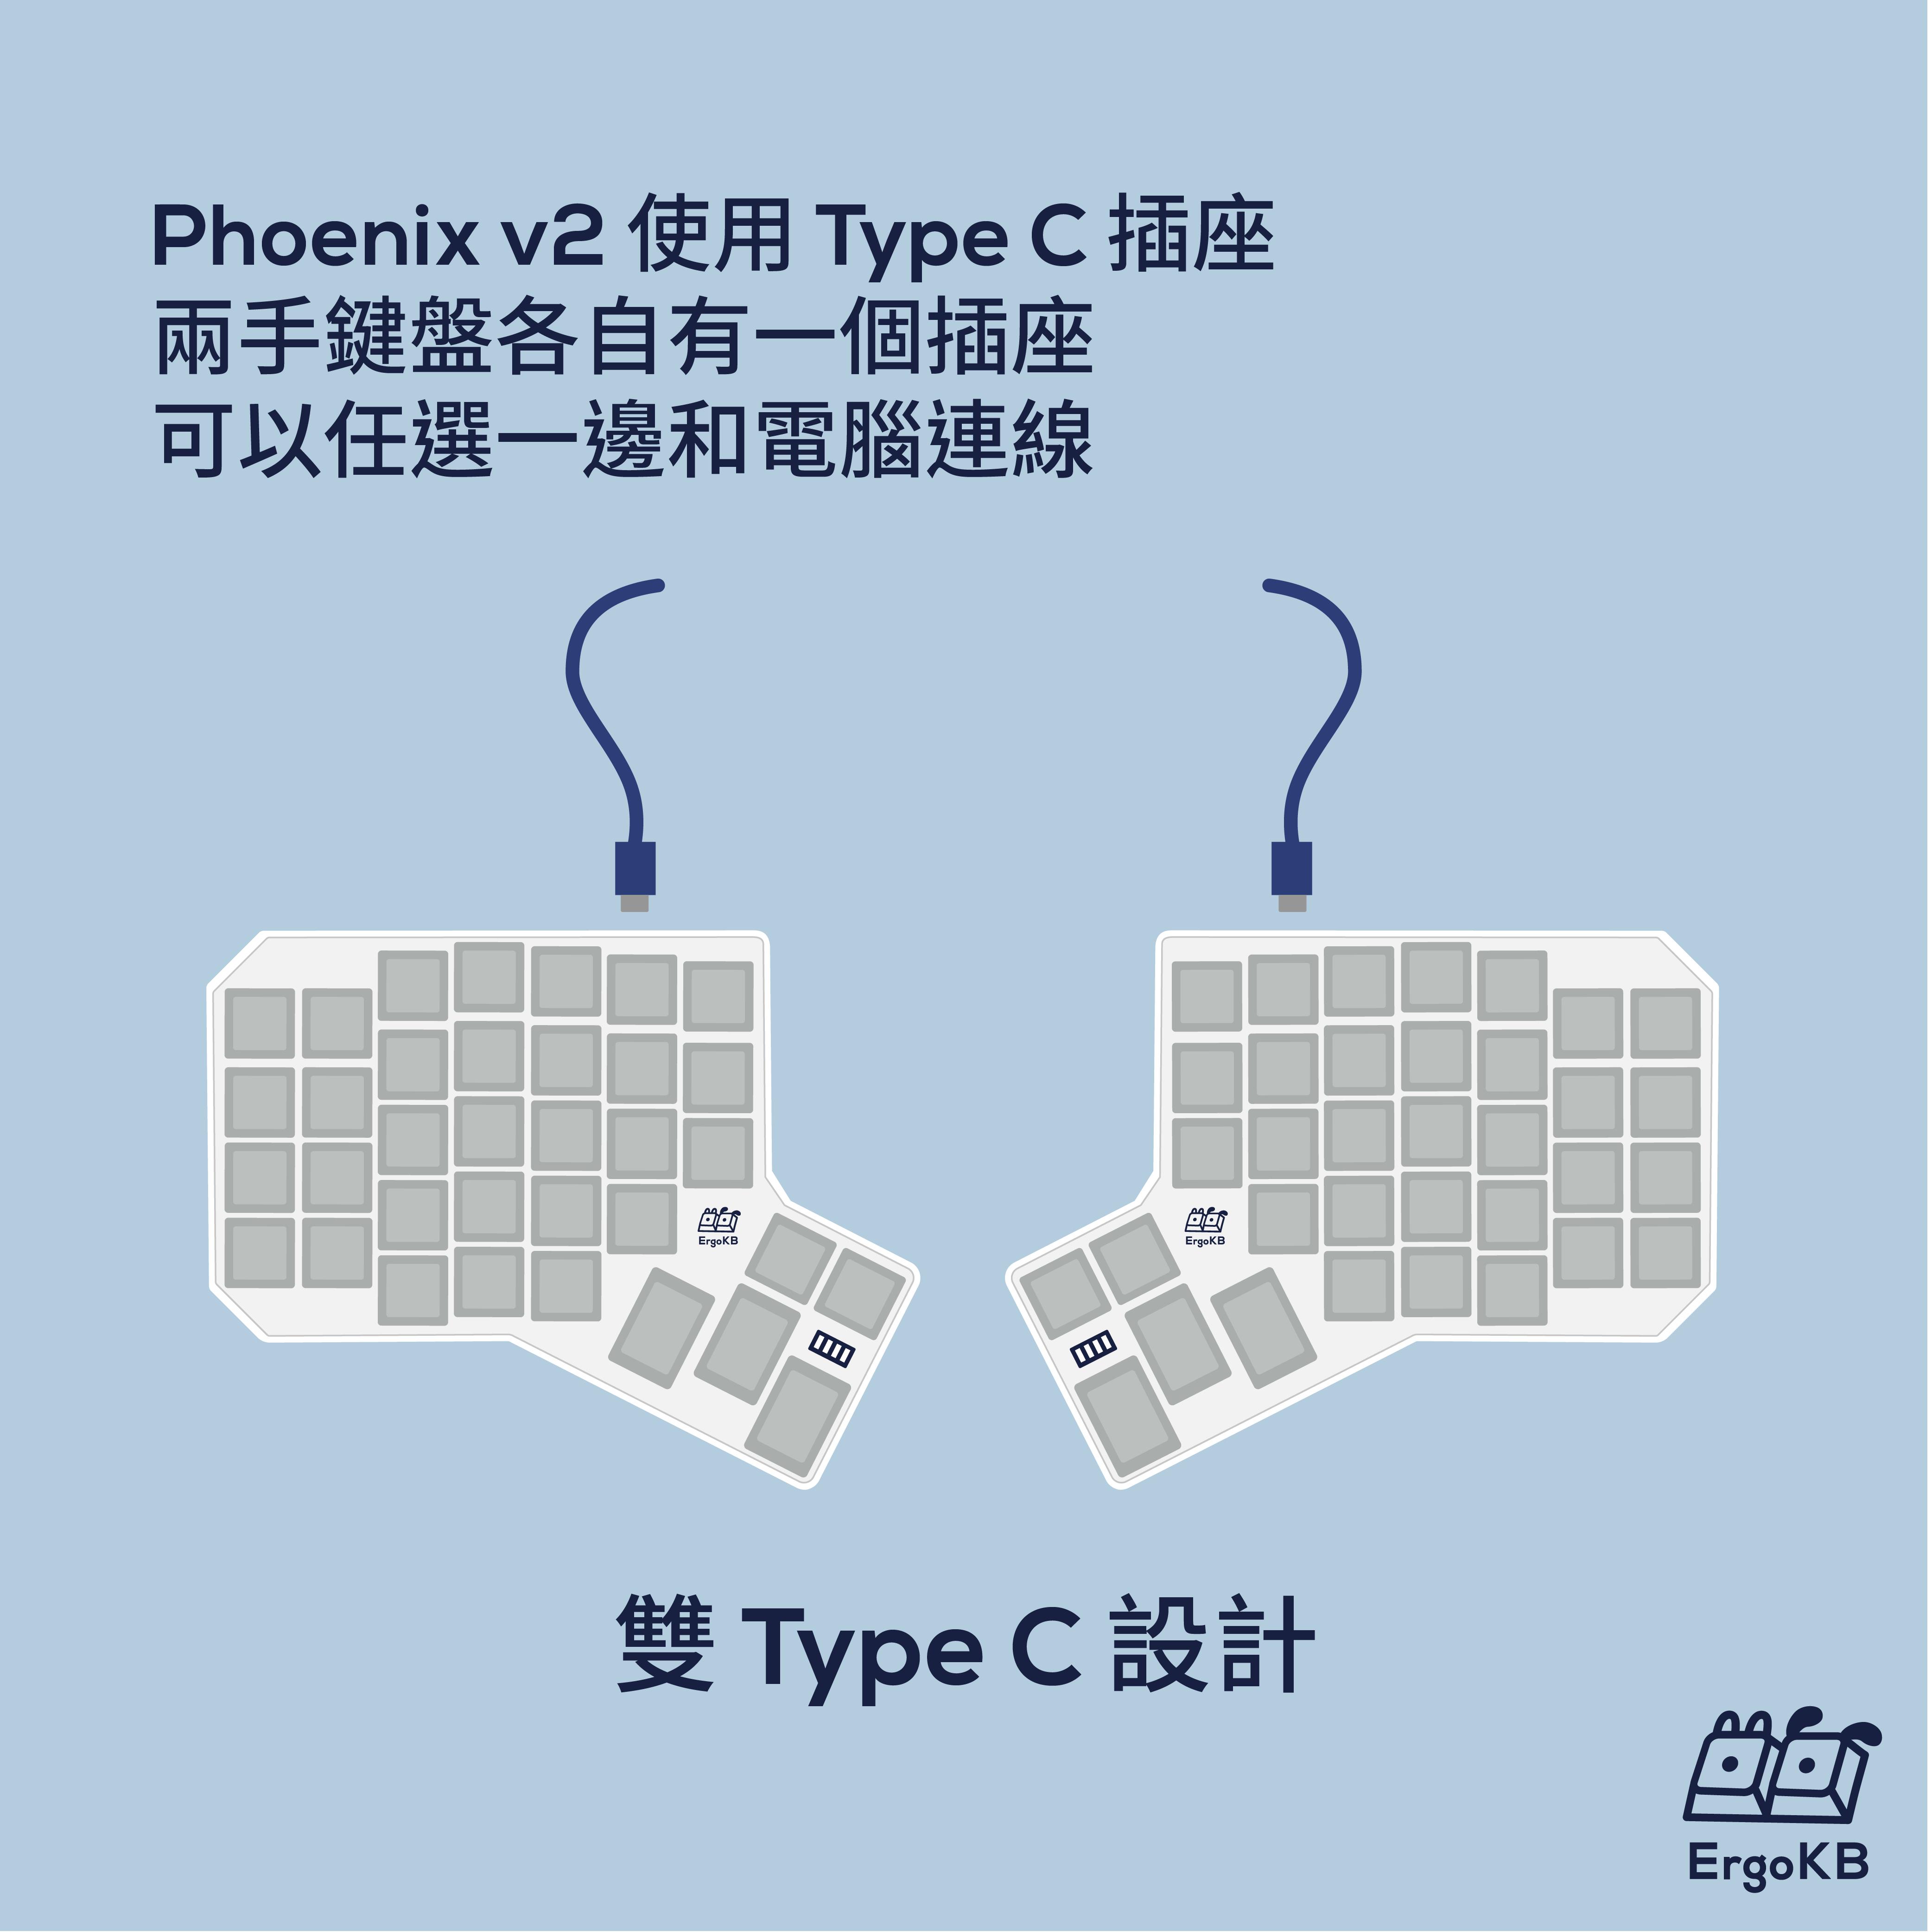 Phoenix 使用 Type C 插座,兩首鍵盤各自有一個插座,可以任選一邊和電腦連線